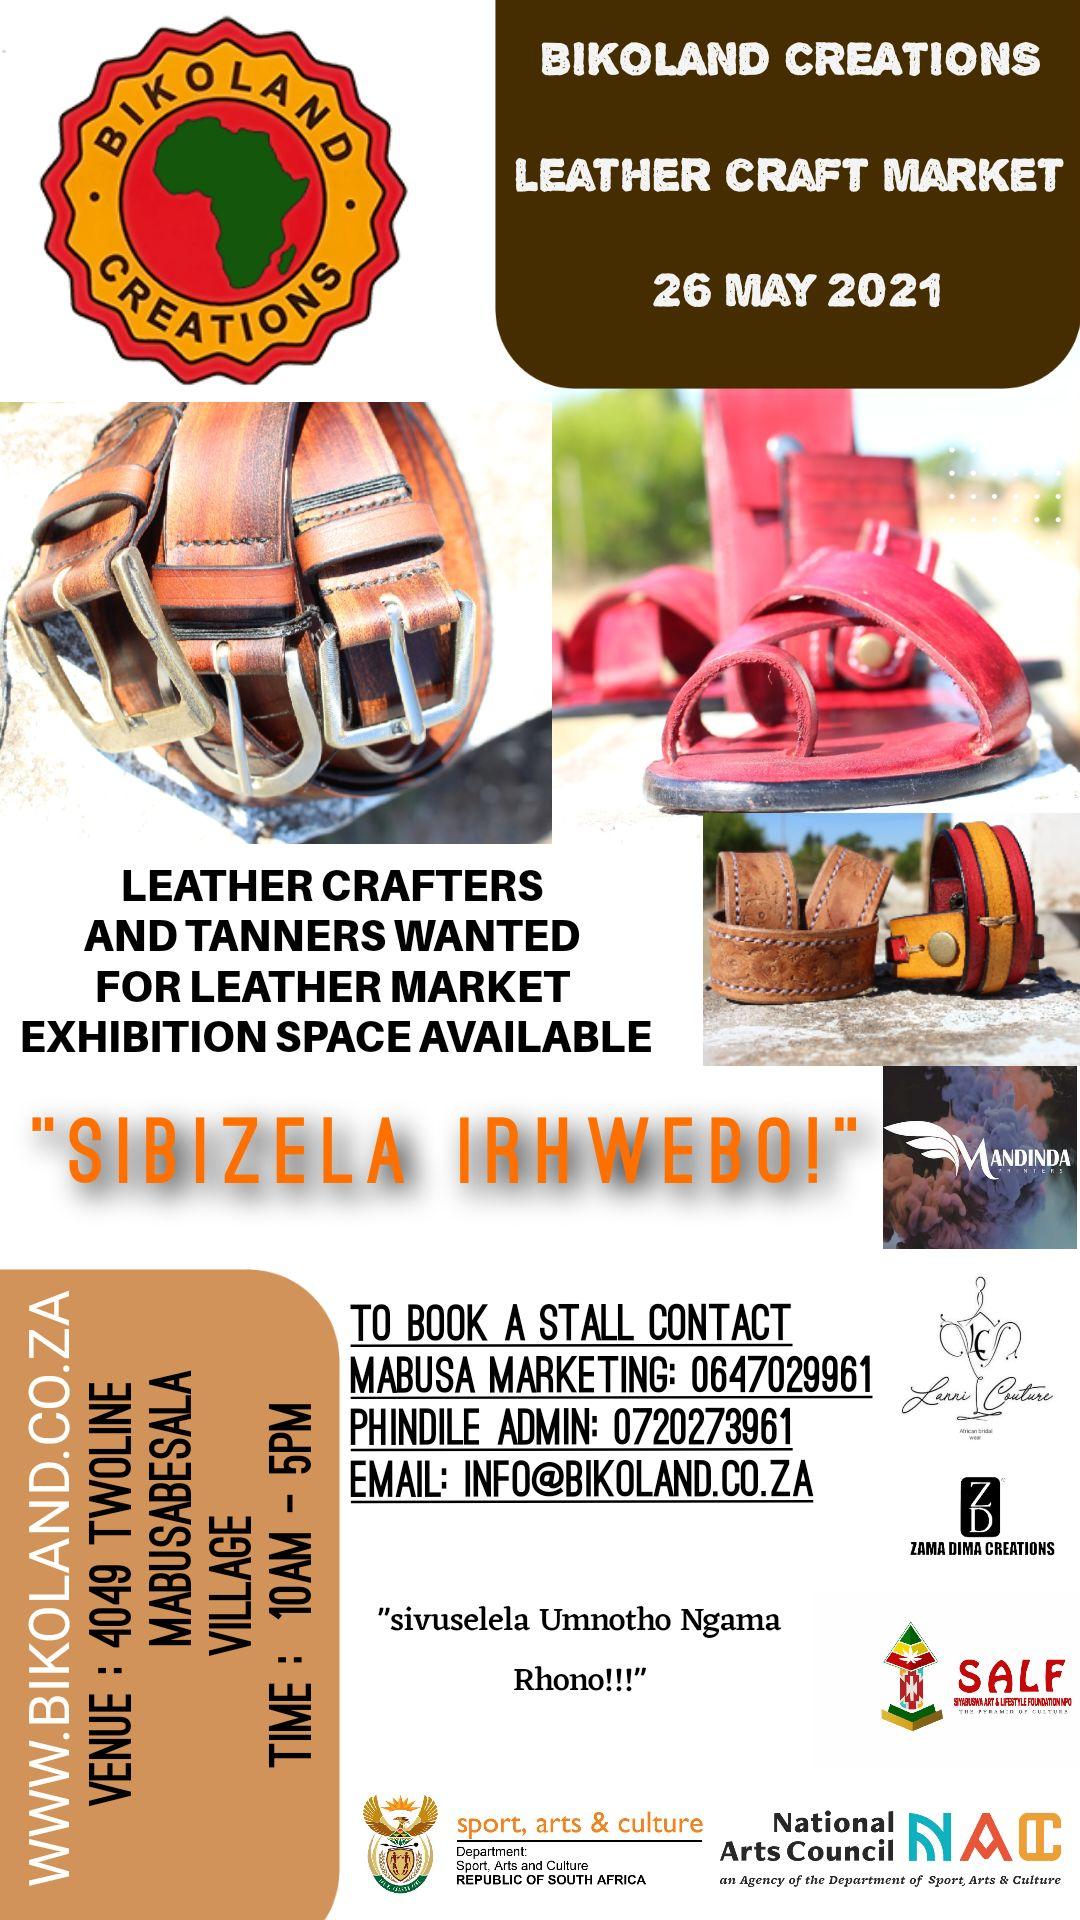 Bikoland Creations Leather Craft Market